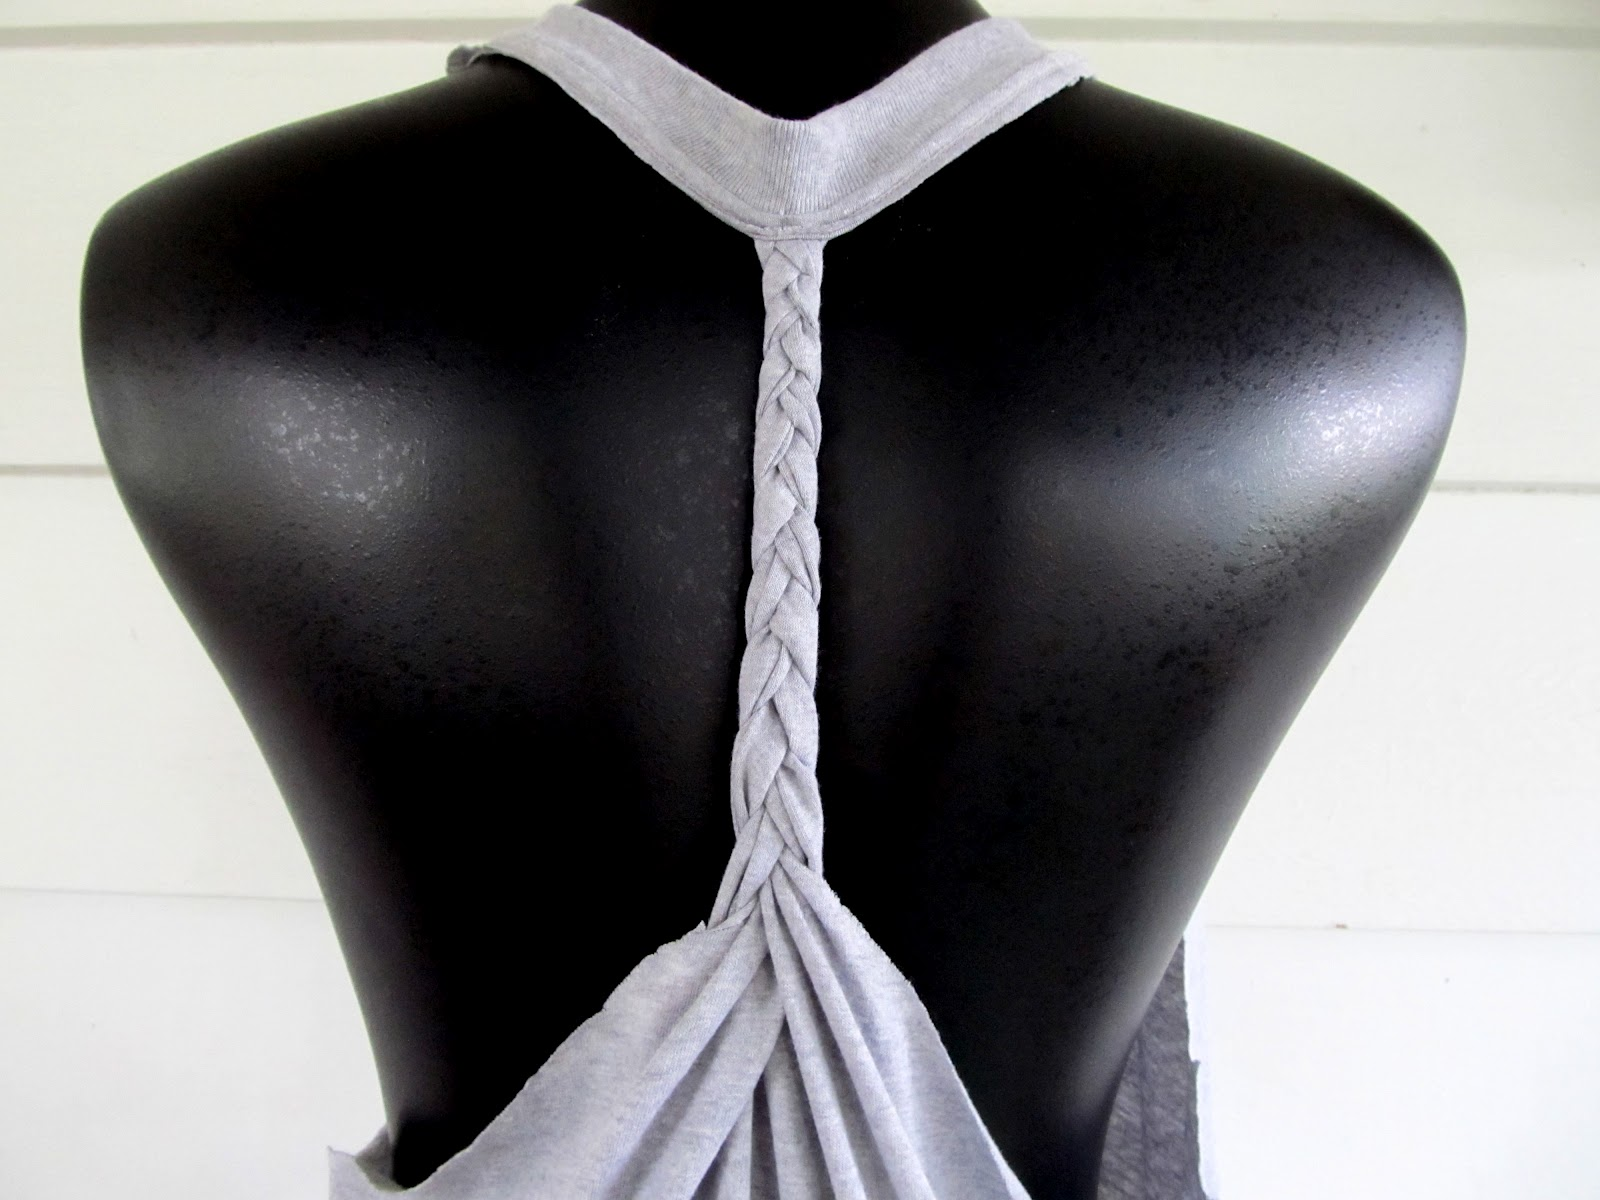 wobisobi racer back tee diy 2 braided back - T Shirt Cutting Designs Ideas